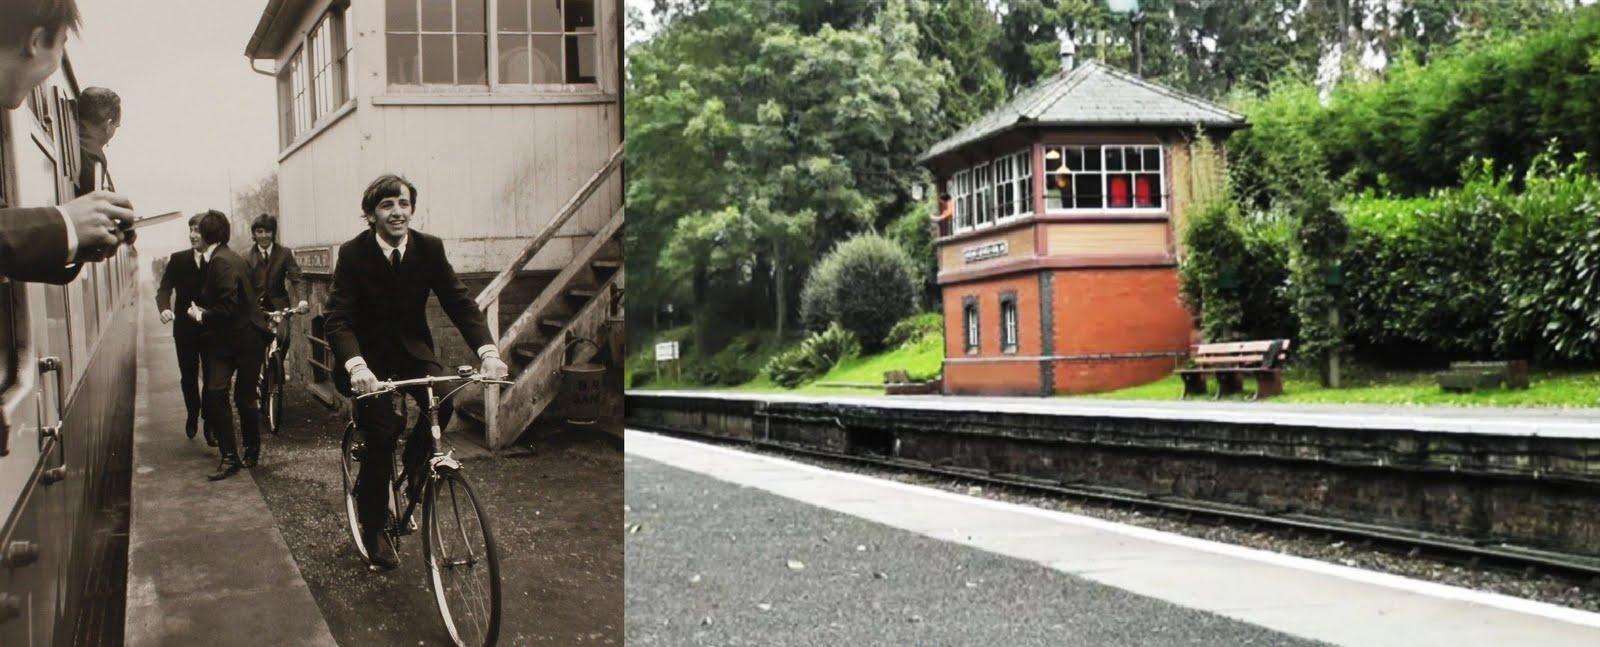 Kenwood Crowcombe Heathfield Rail Station Spherical